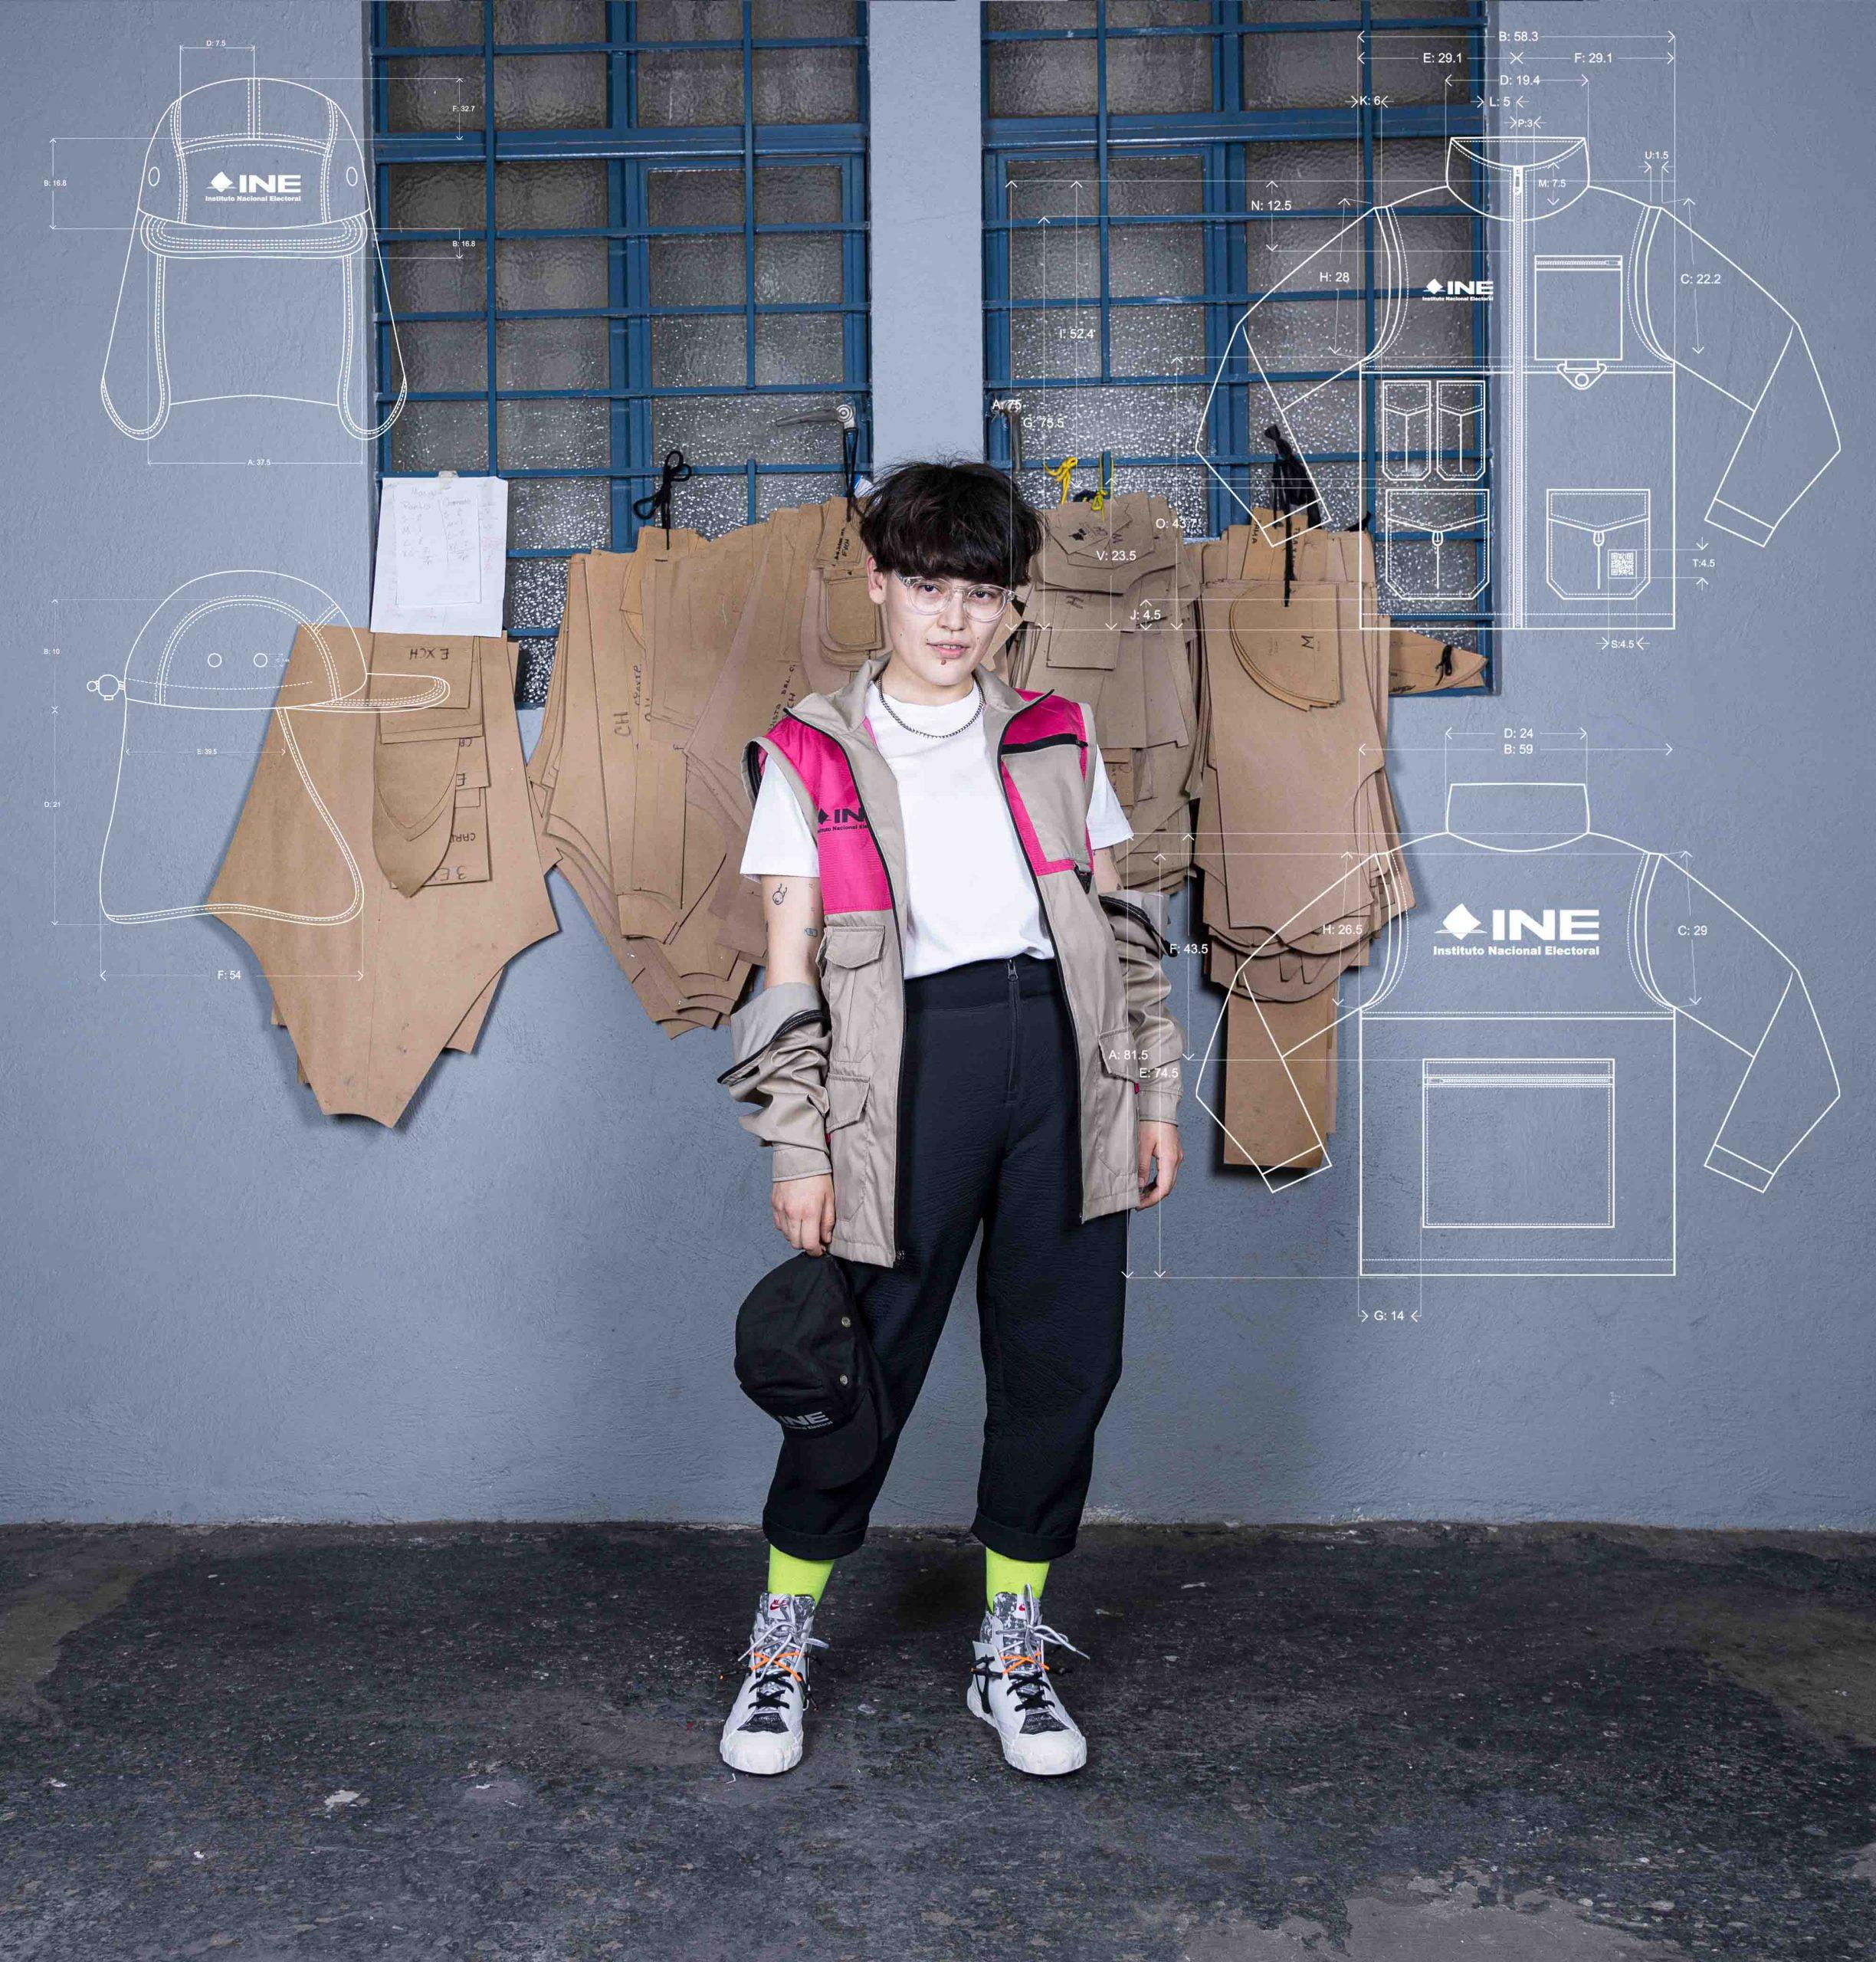 Cinthya Bfl modelando el uniforme ine 2021